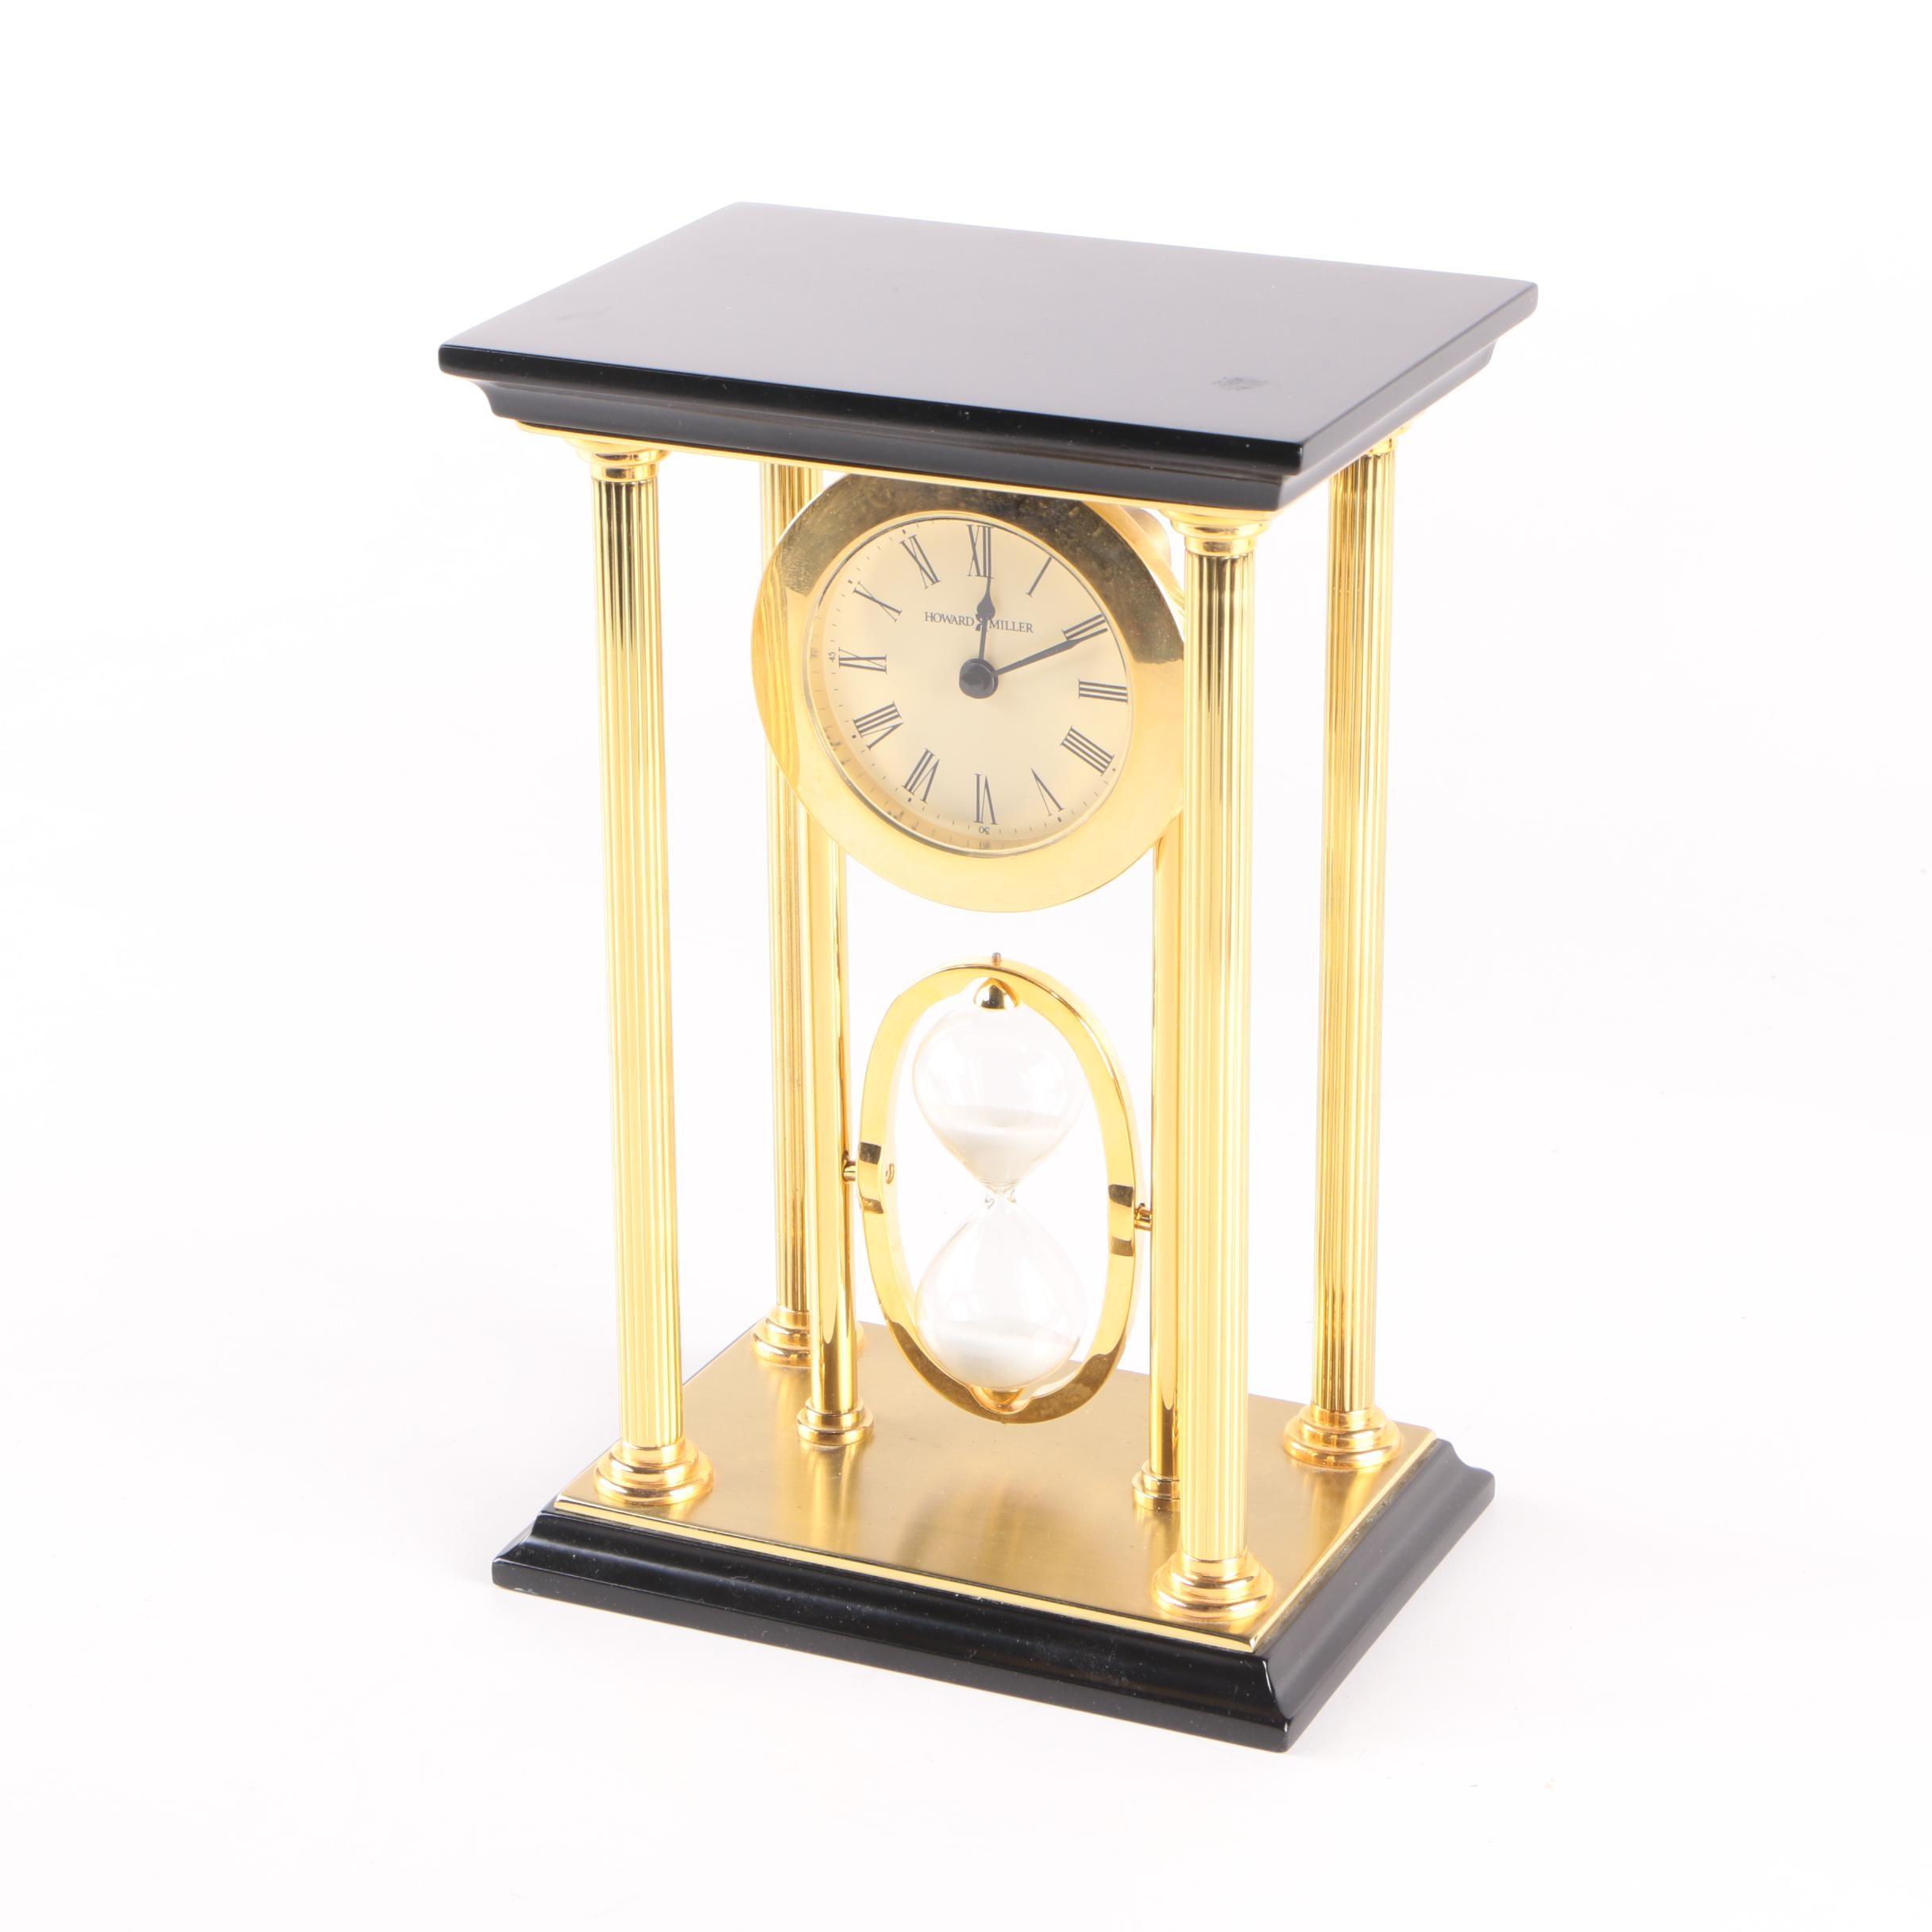 Howard Miller Hourglass Mantel Clock